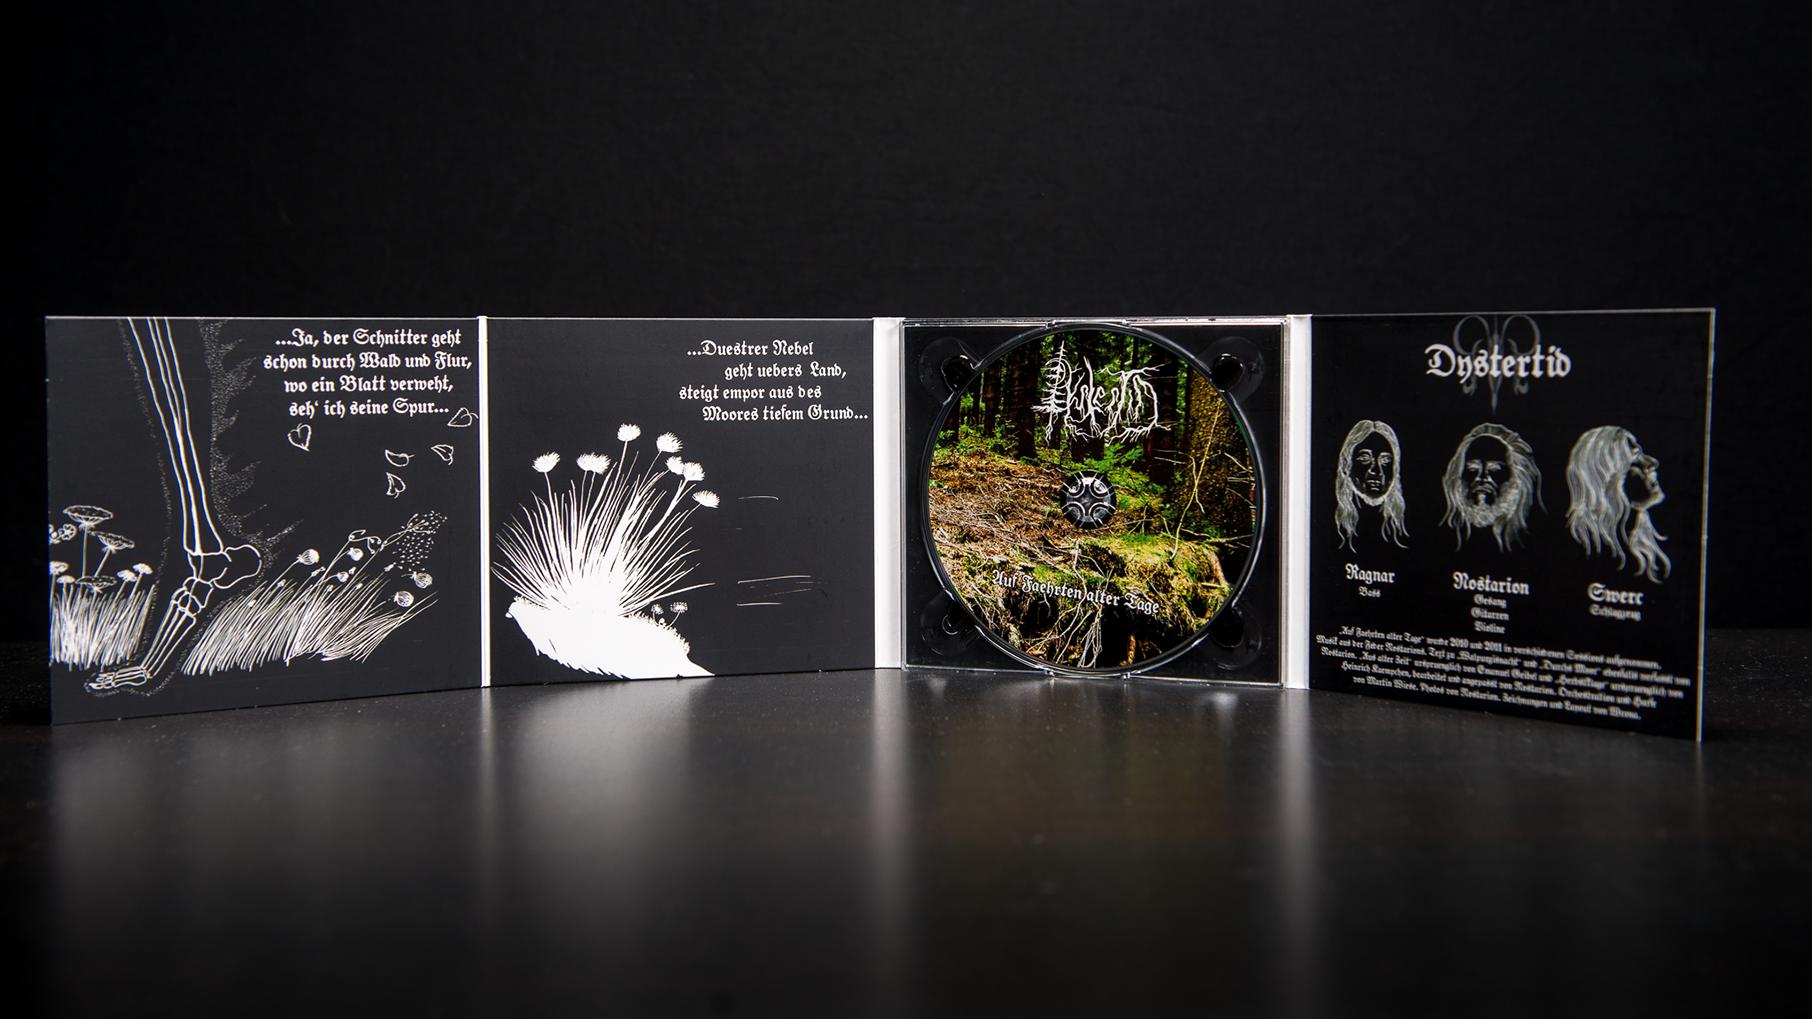 Dystertid - Auf Faehrten alter Tage CD Digipack